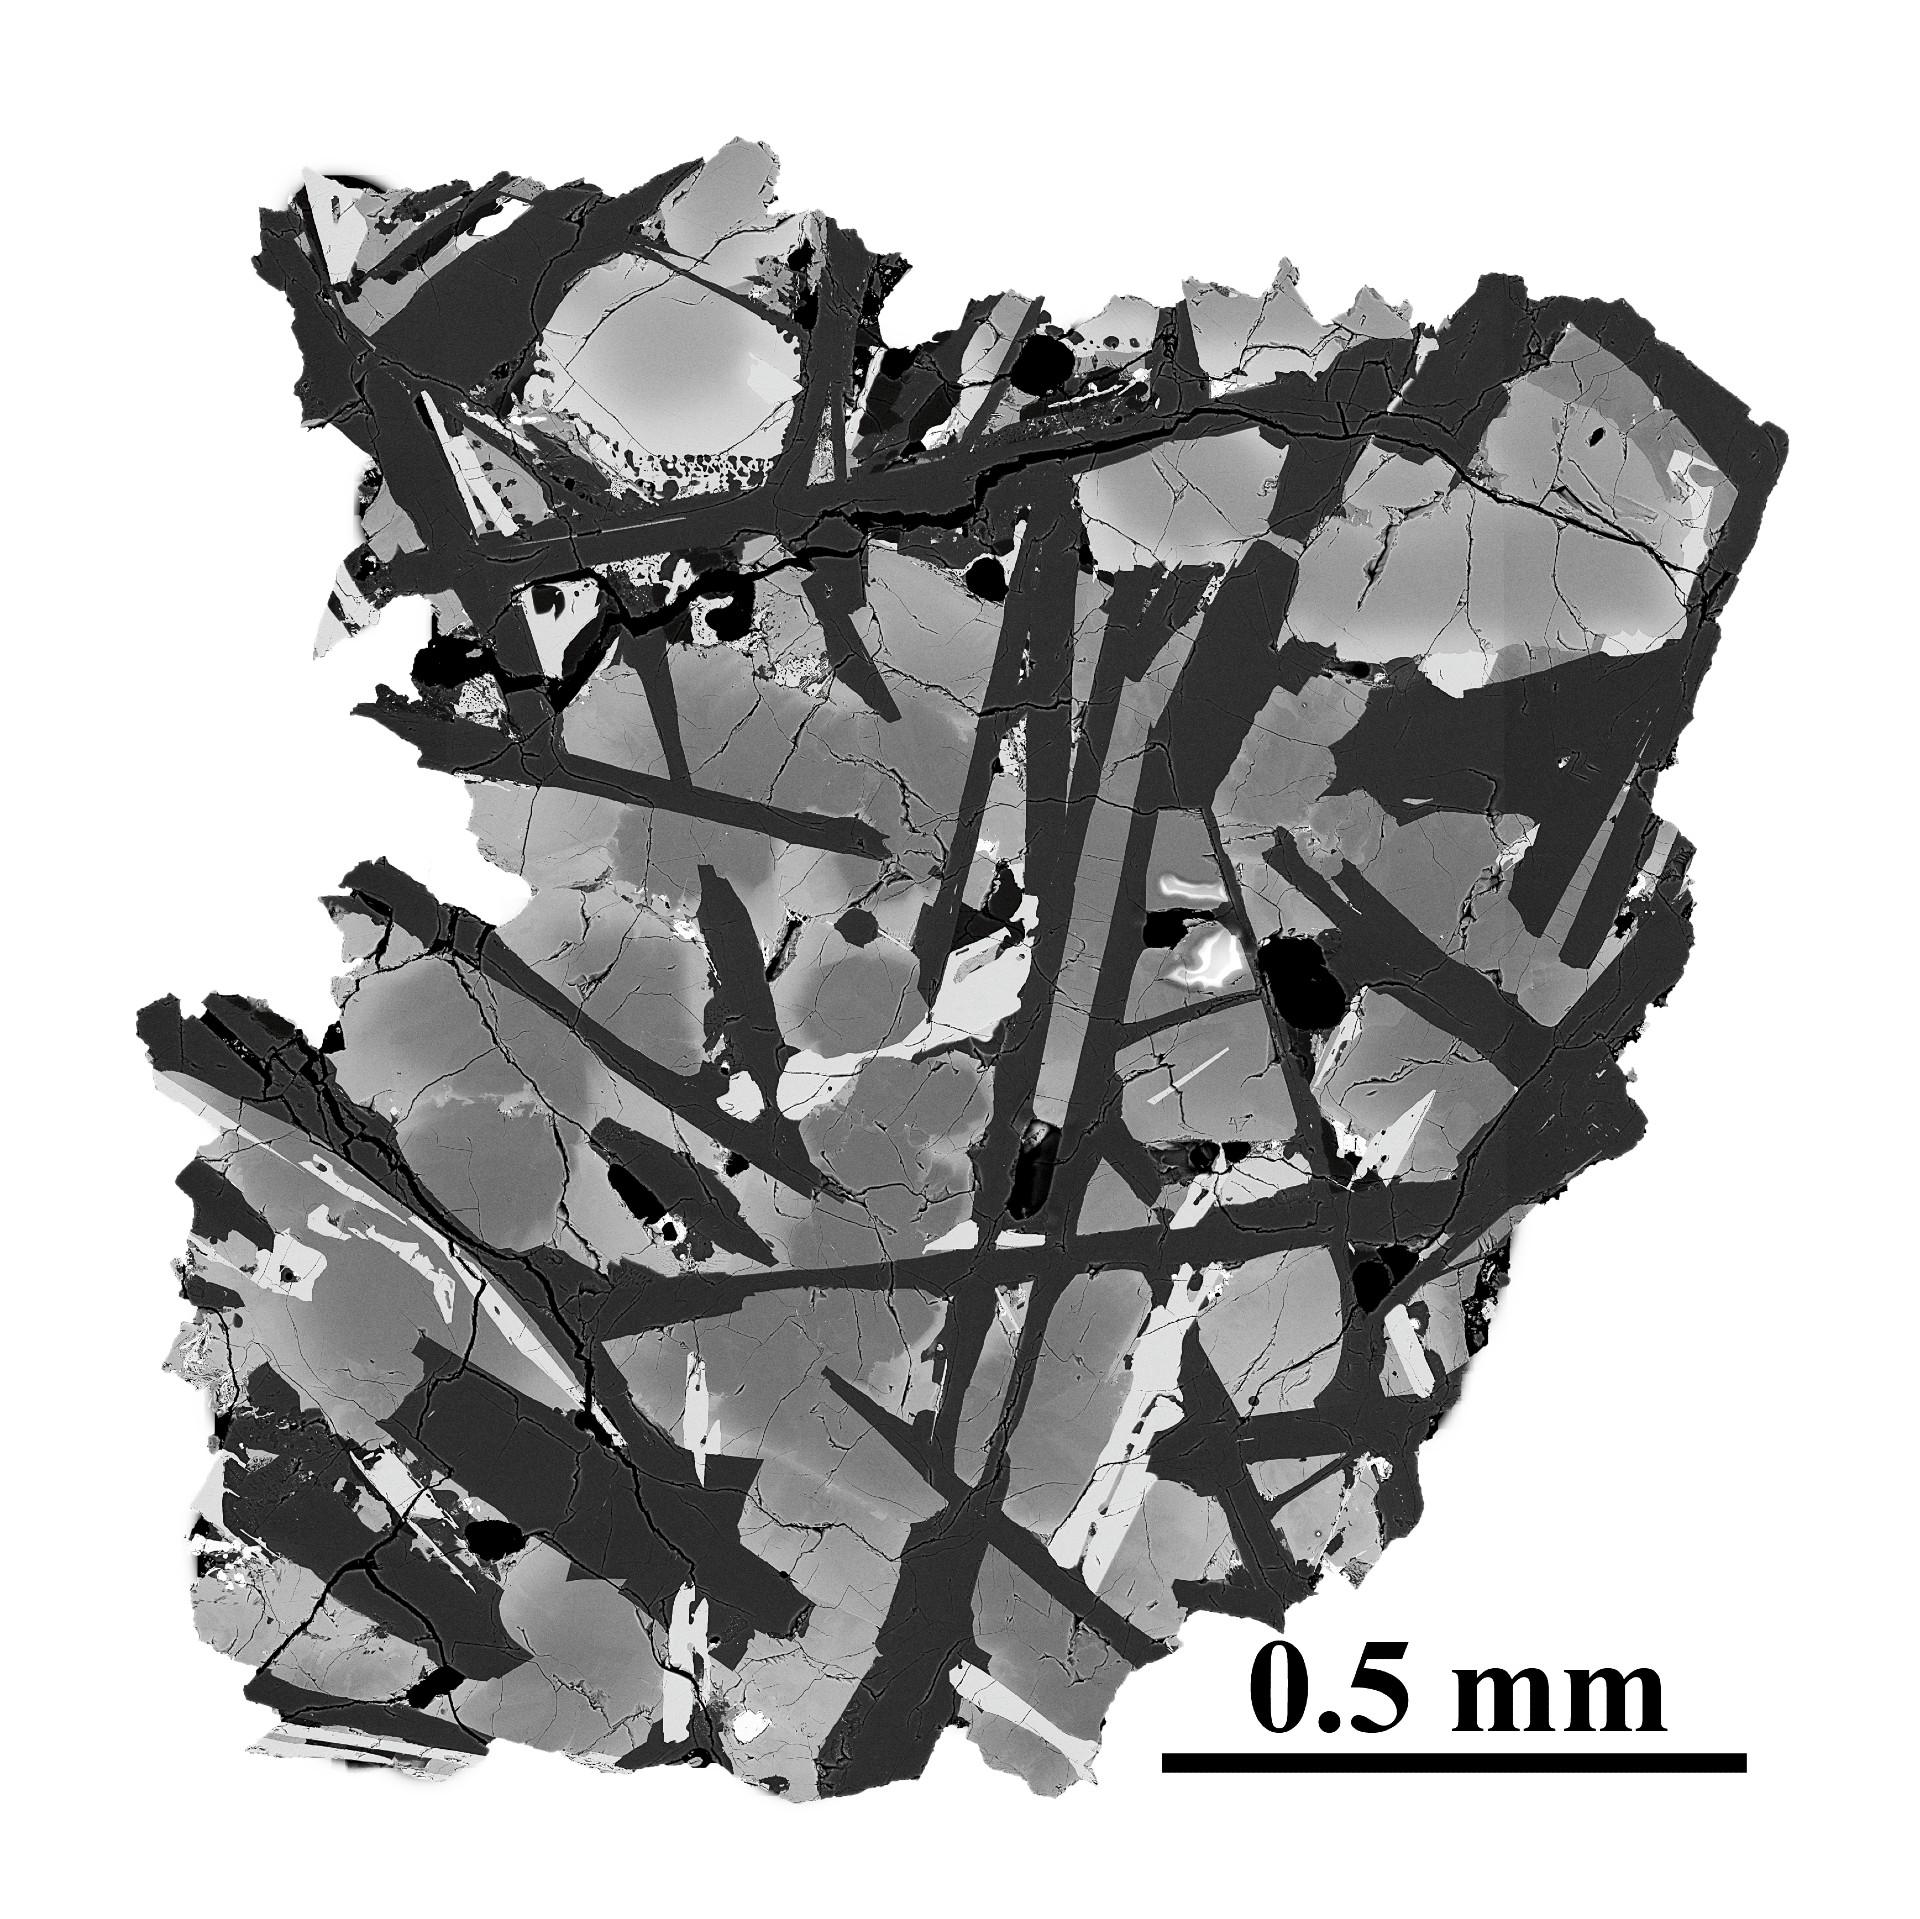 Close-up of grey rock with dark grey striations